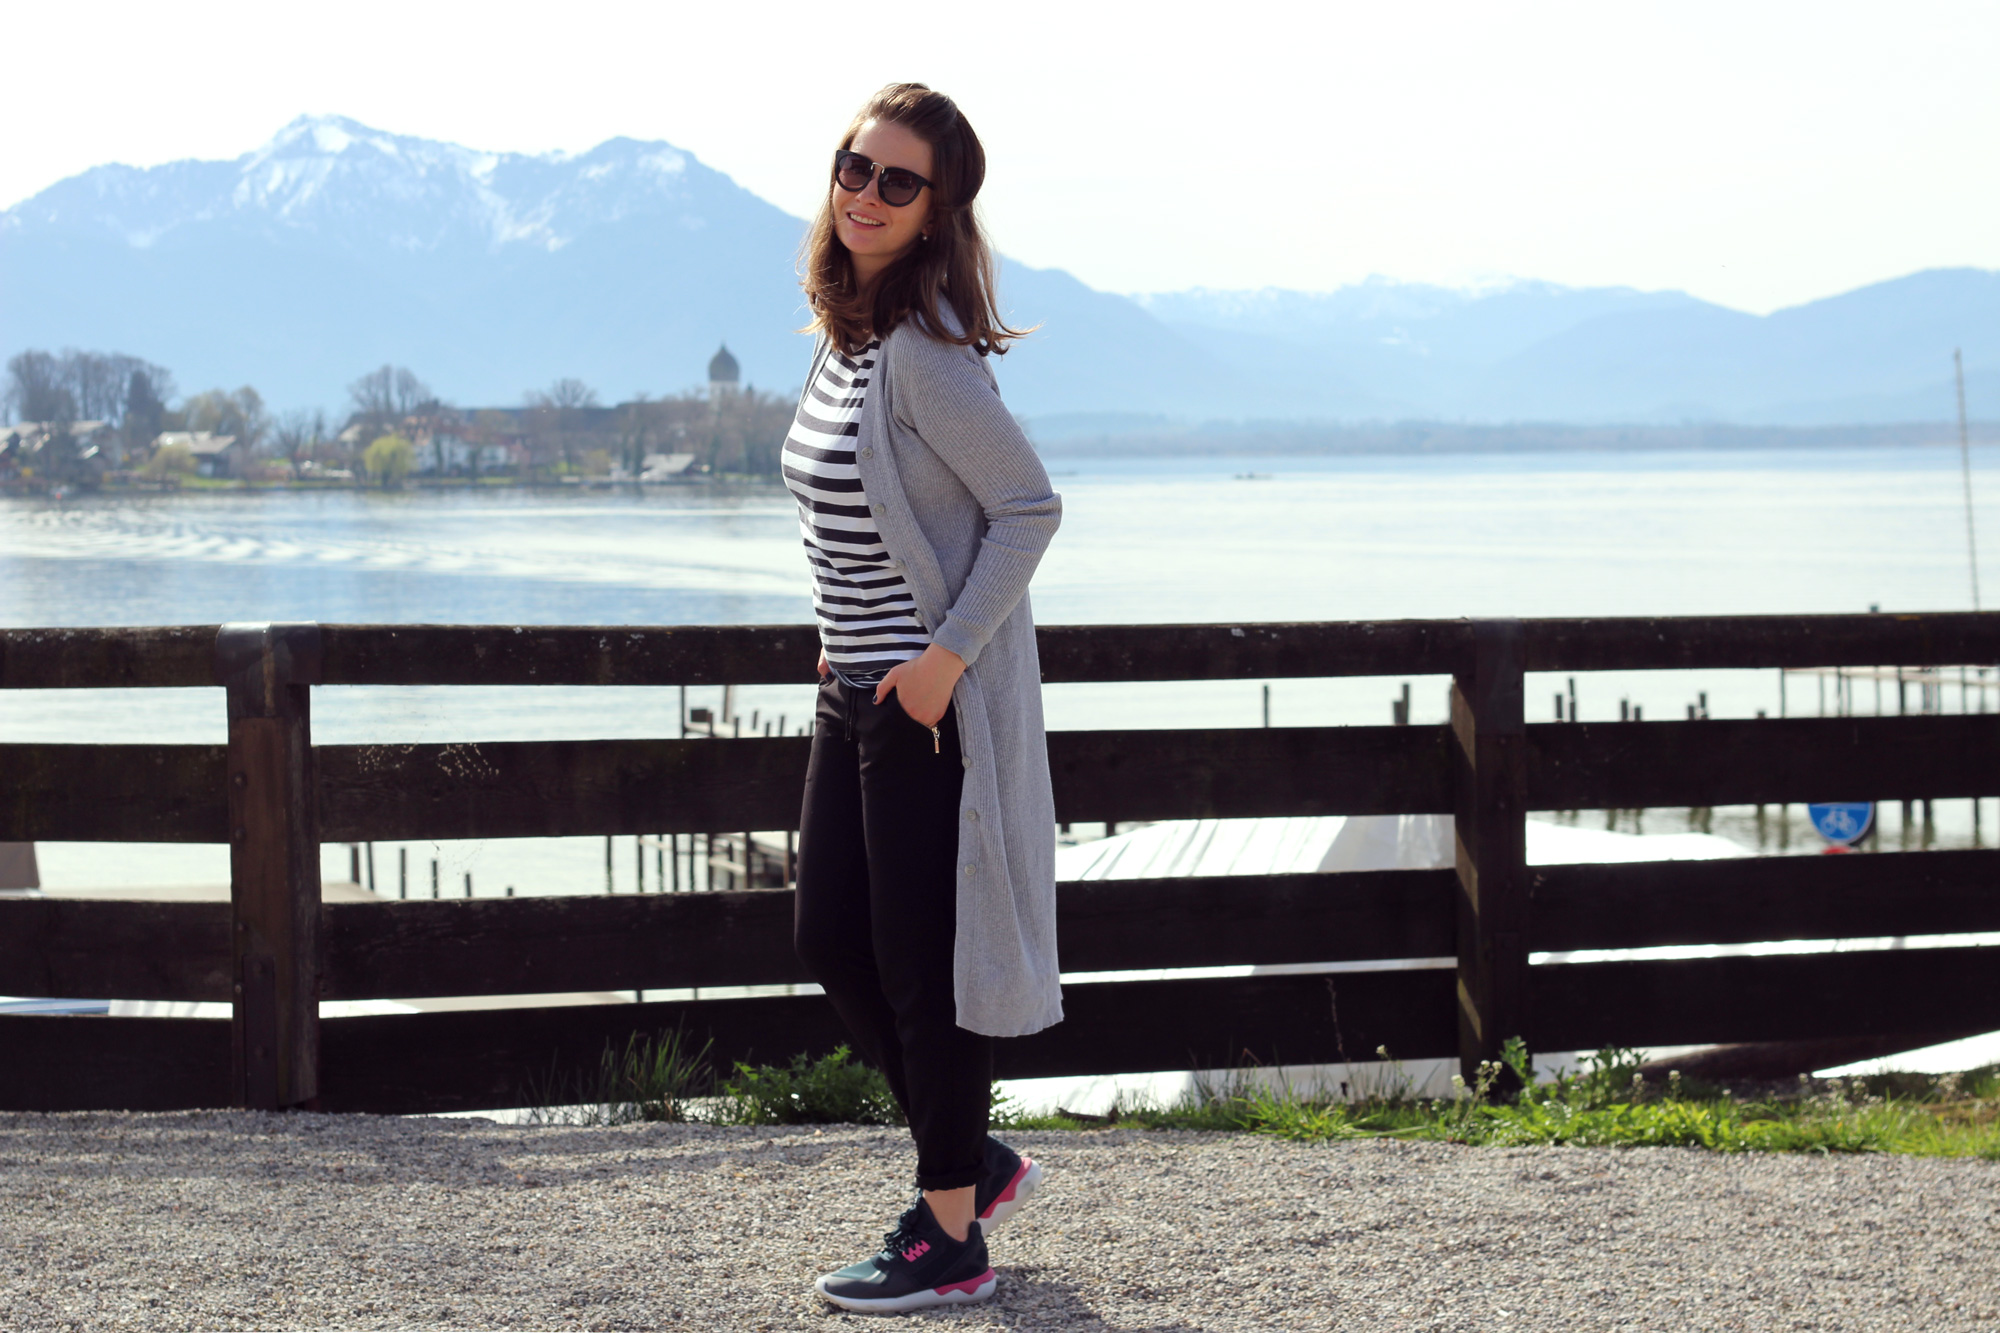 Cheimsee-lake-Bayern-weekend-escape-3